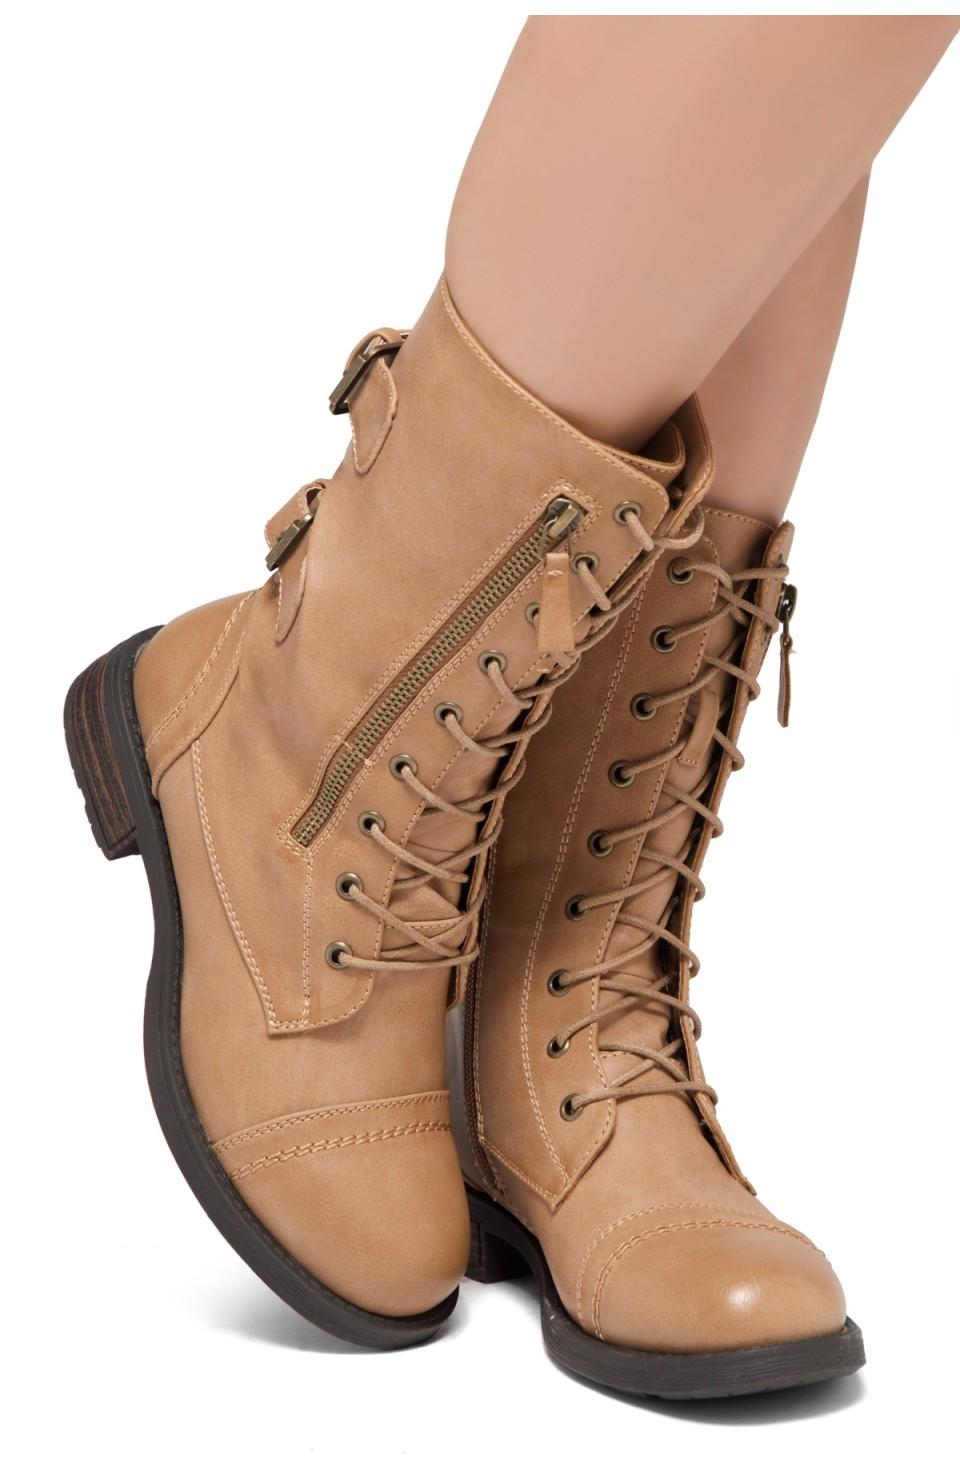 ShoeLand KASEY-Women's Military Lace Up Front, Zipper, Double Buckled, Combat Boots (Mauve)